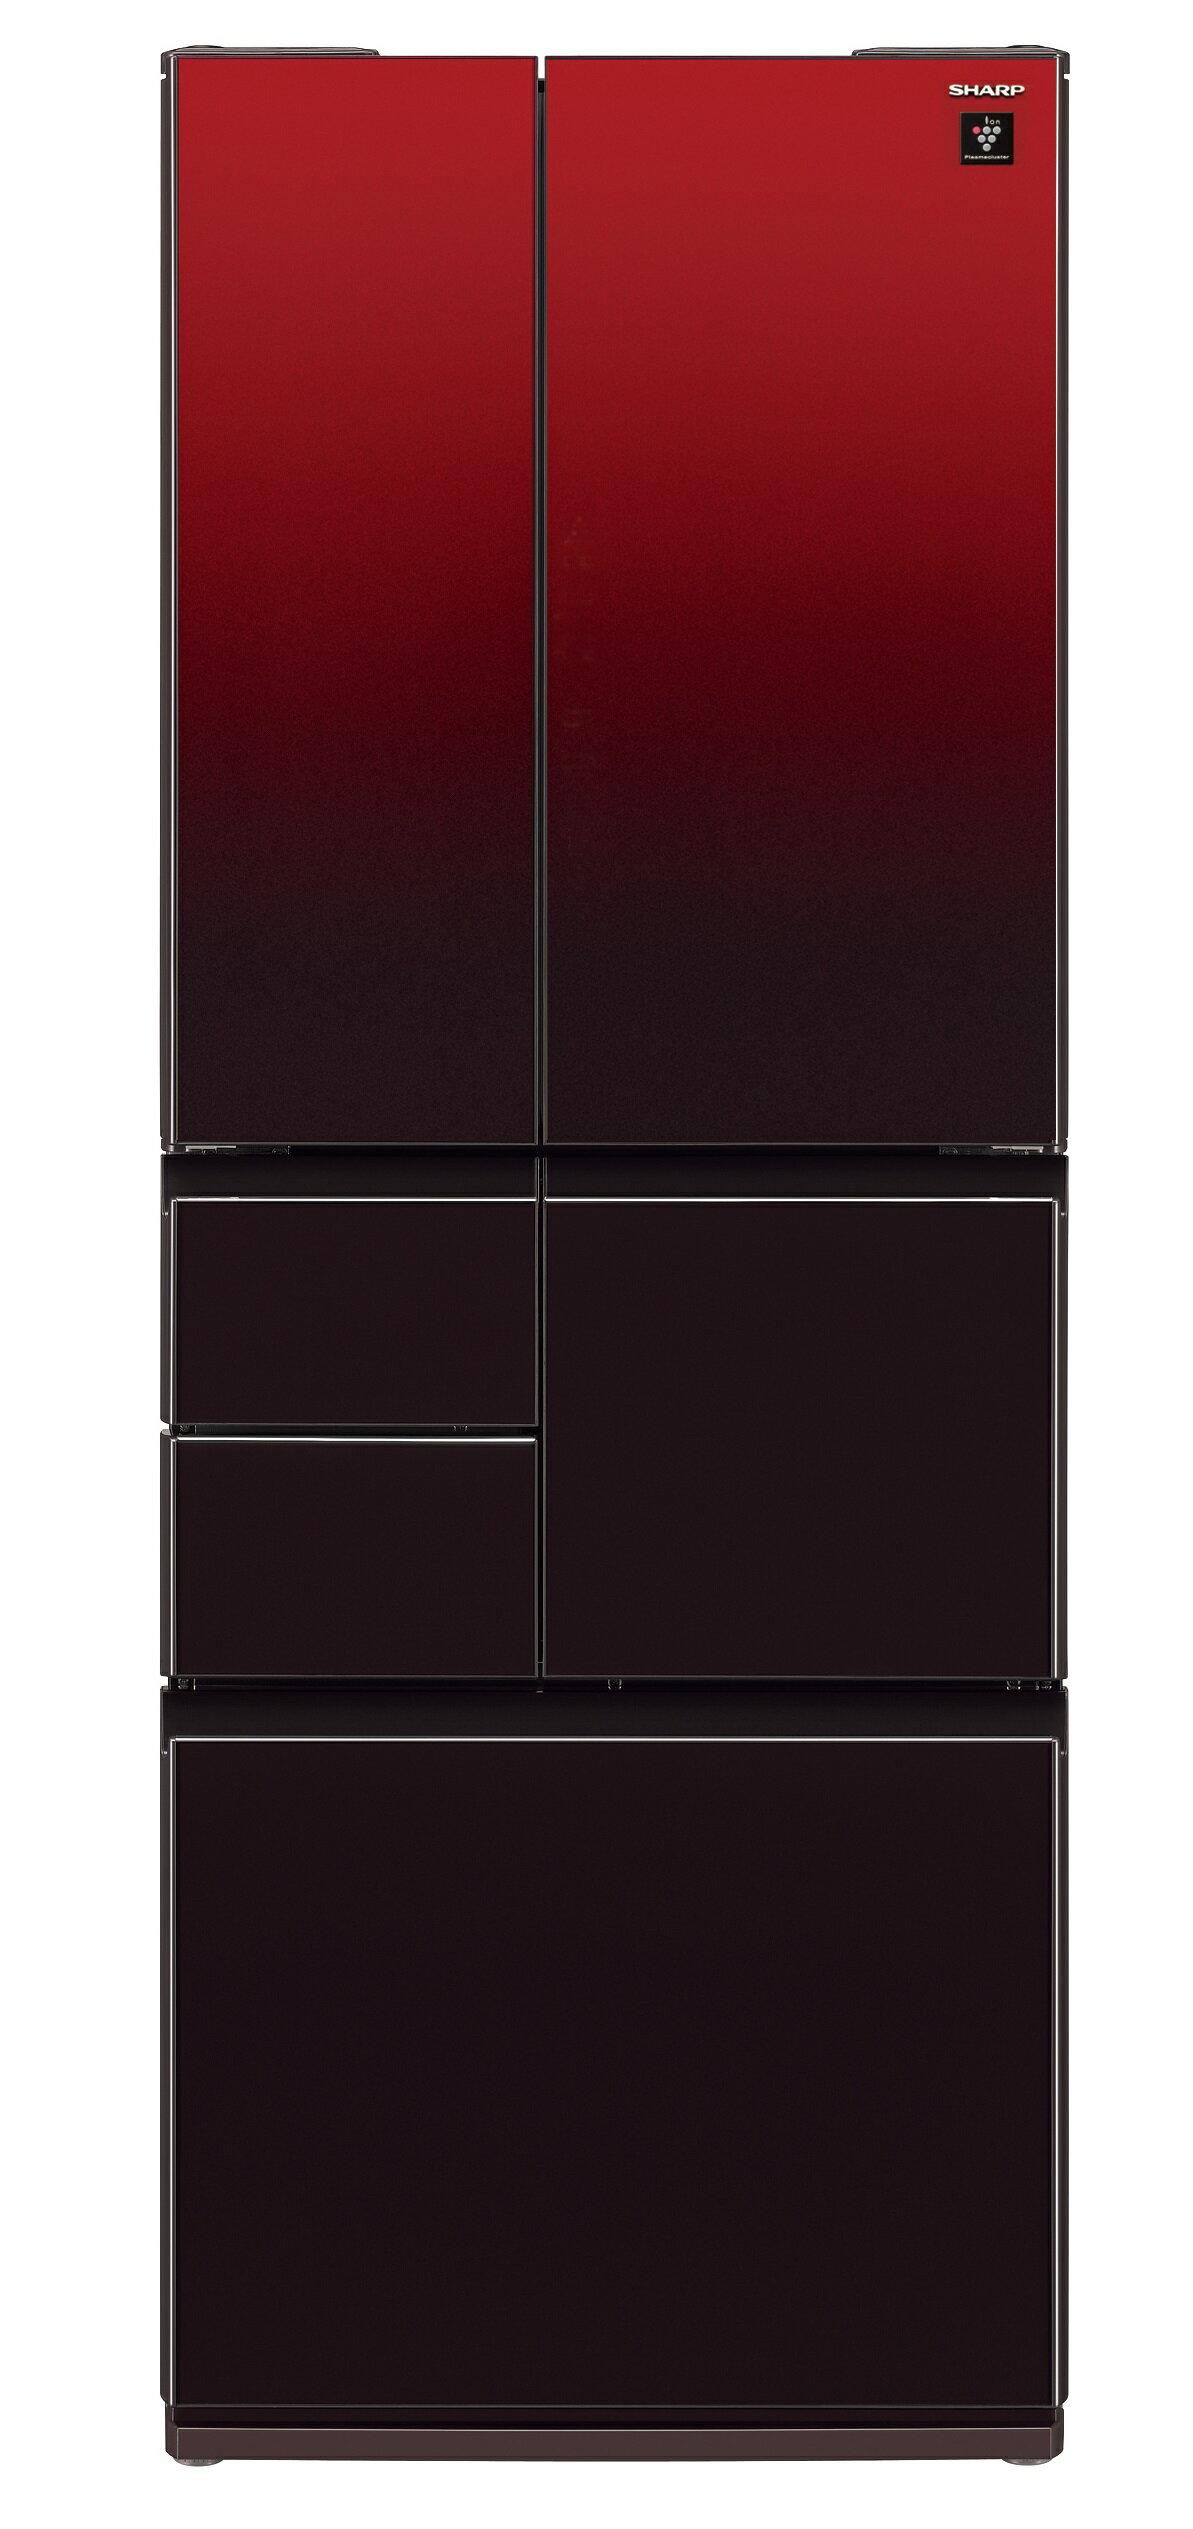 <br/><br/>  SHARP 夏普 SJ-GT50BT-R (星鑽紅) 變頻六門對開冰箱 (501L) ~日本製~【零利率】※熱線07-7428010<br/><br/>